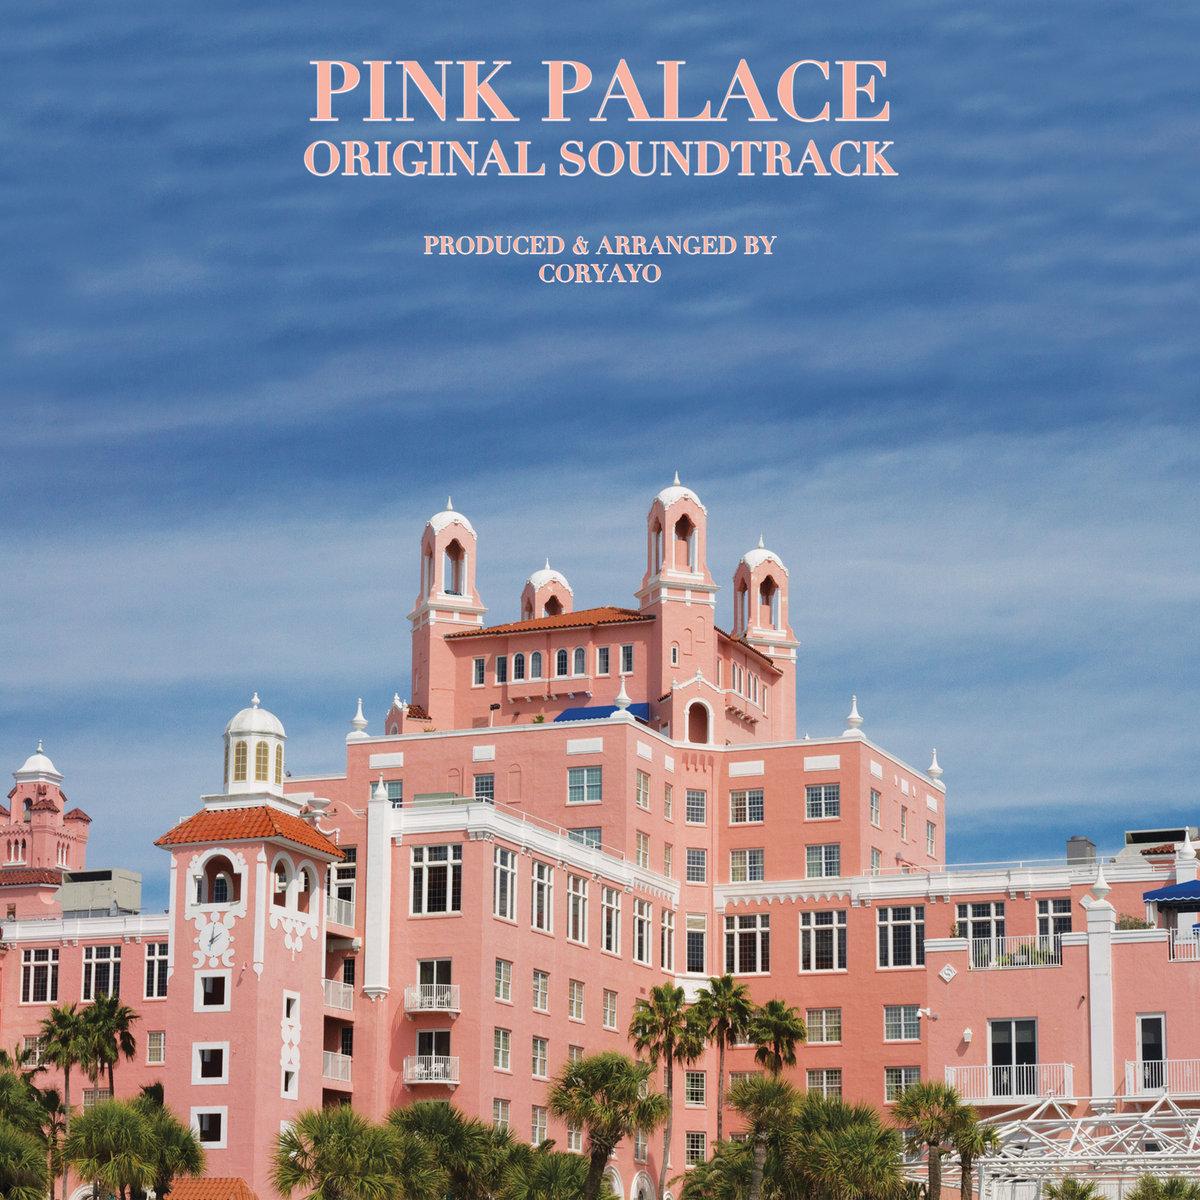 CoryaYo – PinkPalace